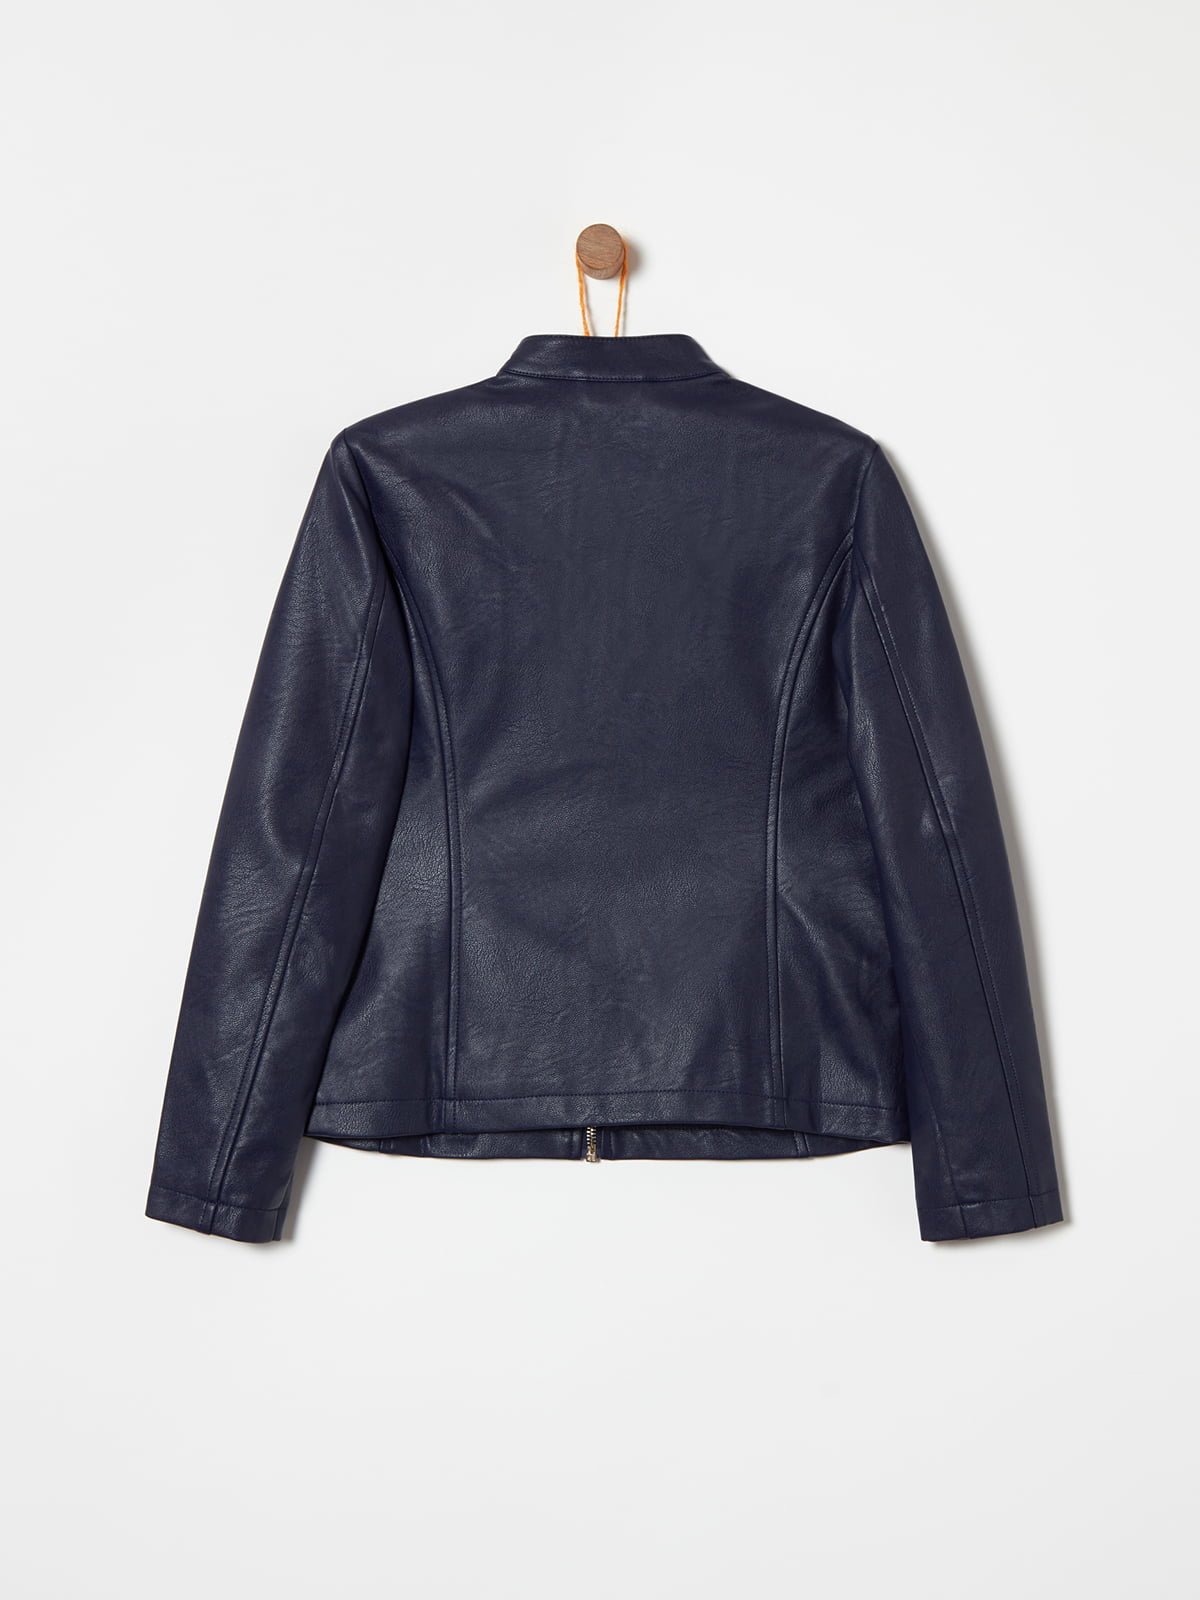 Куртка темно-синя | 4865340 | фото 2